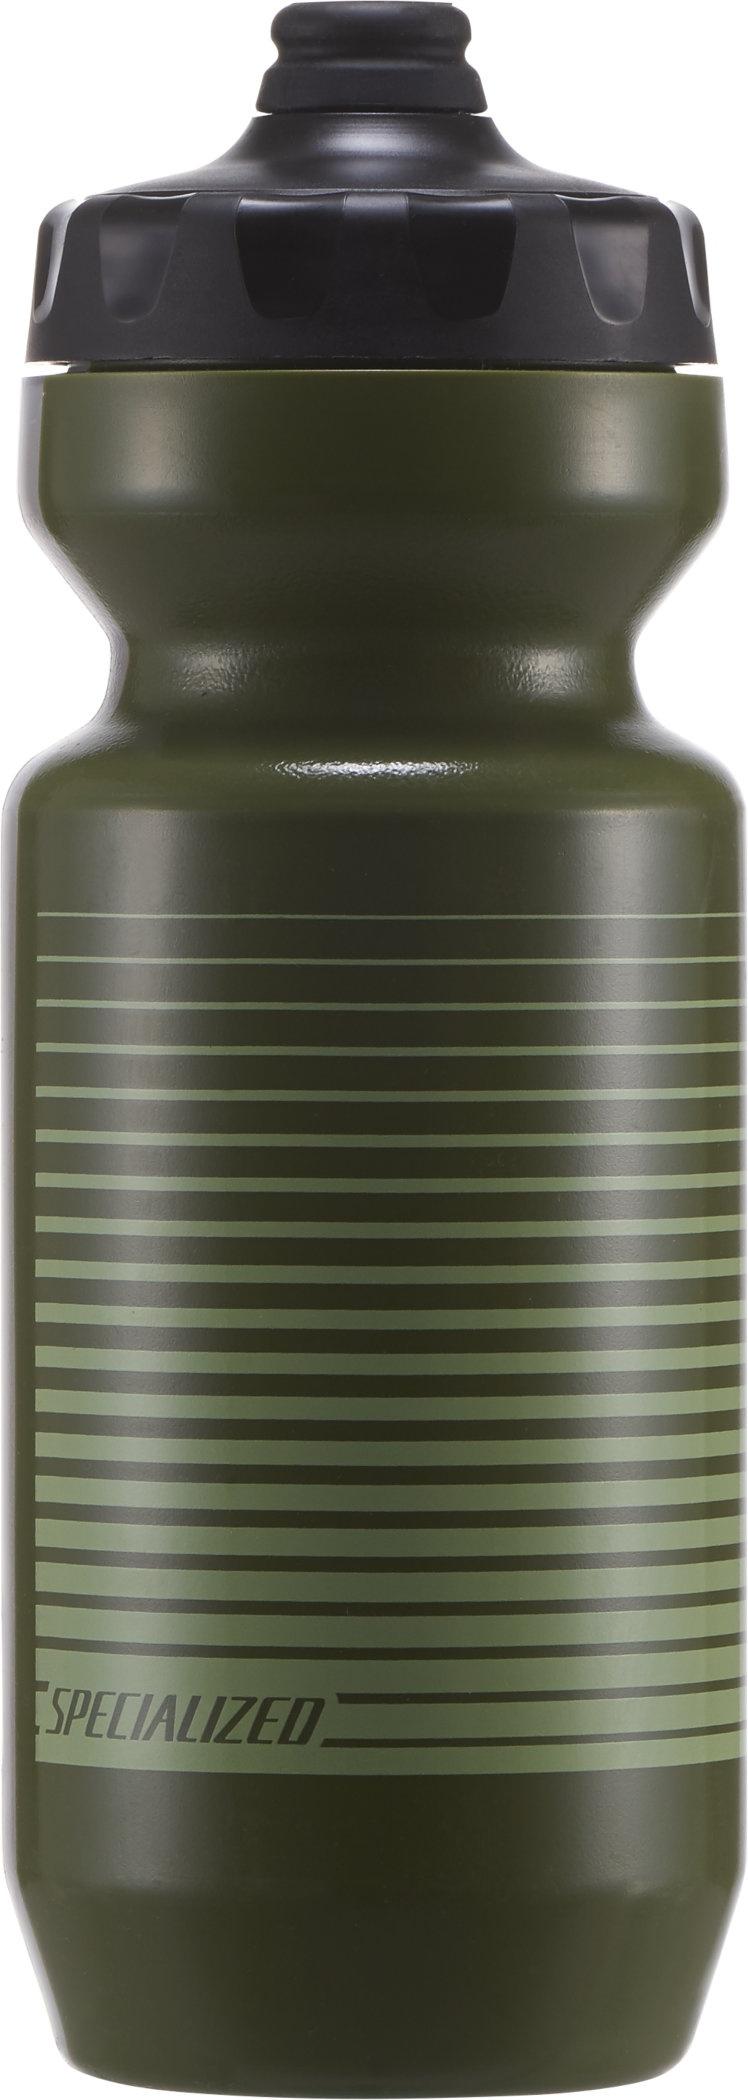 Køb Specialized Purist Fixy 650ml drikkedunk – Moss Green